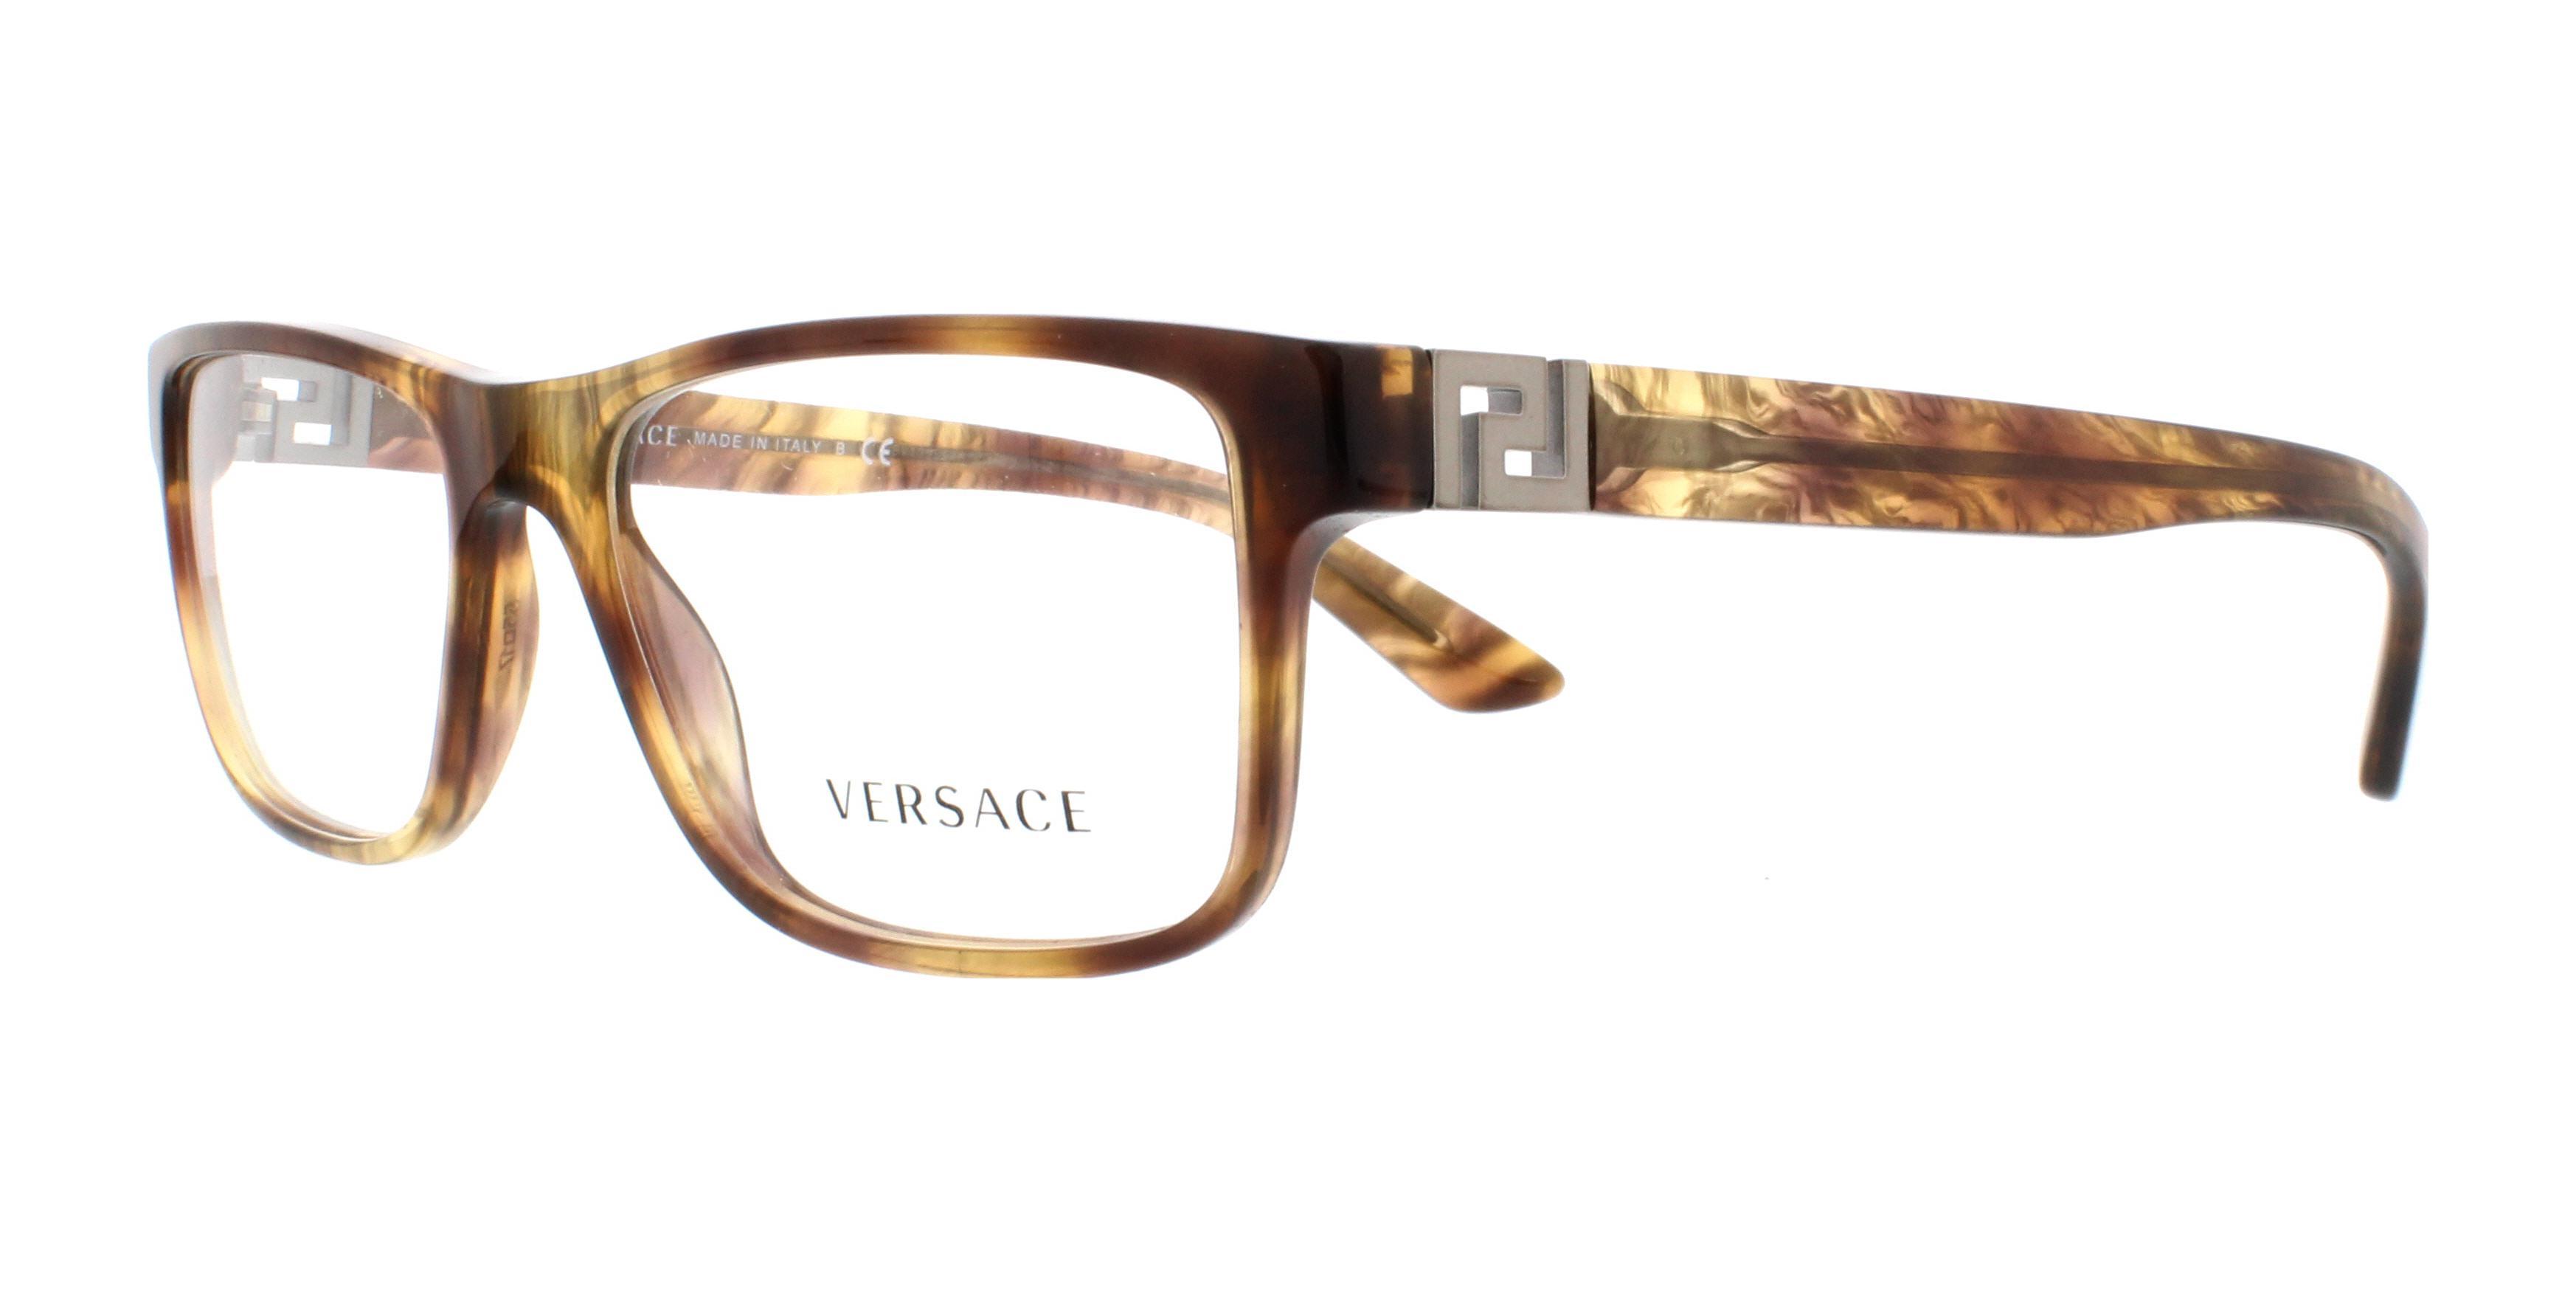 c704679d7c0 VERSACE Eyeglasses VE3211 5143 Striped Havana 55MM 8053672400250